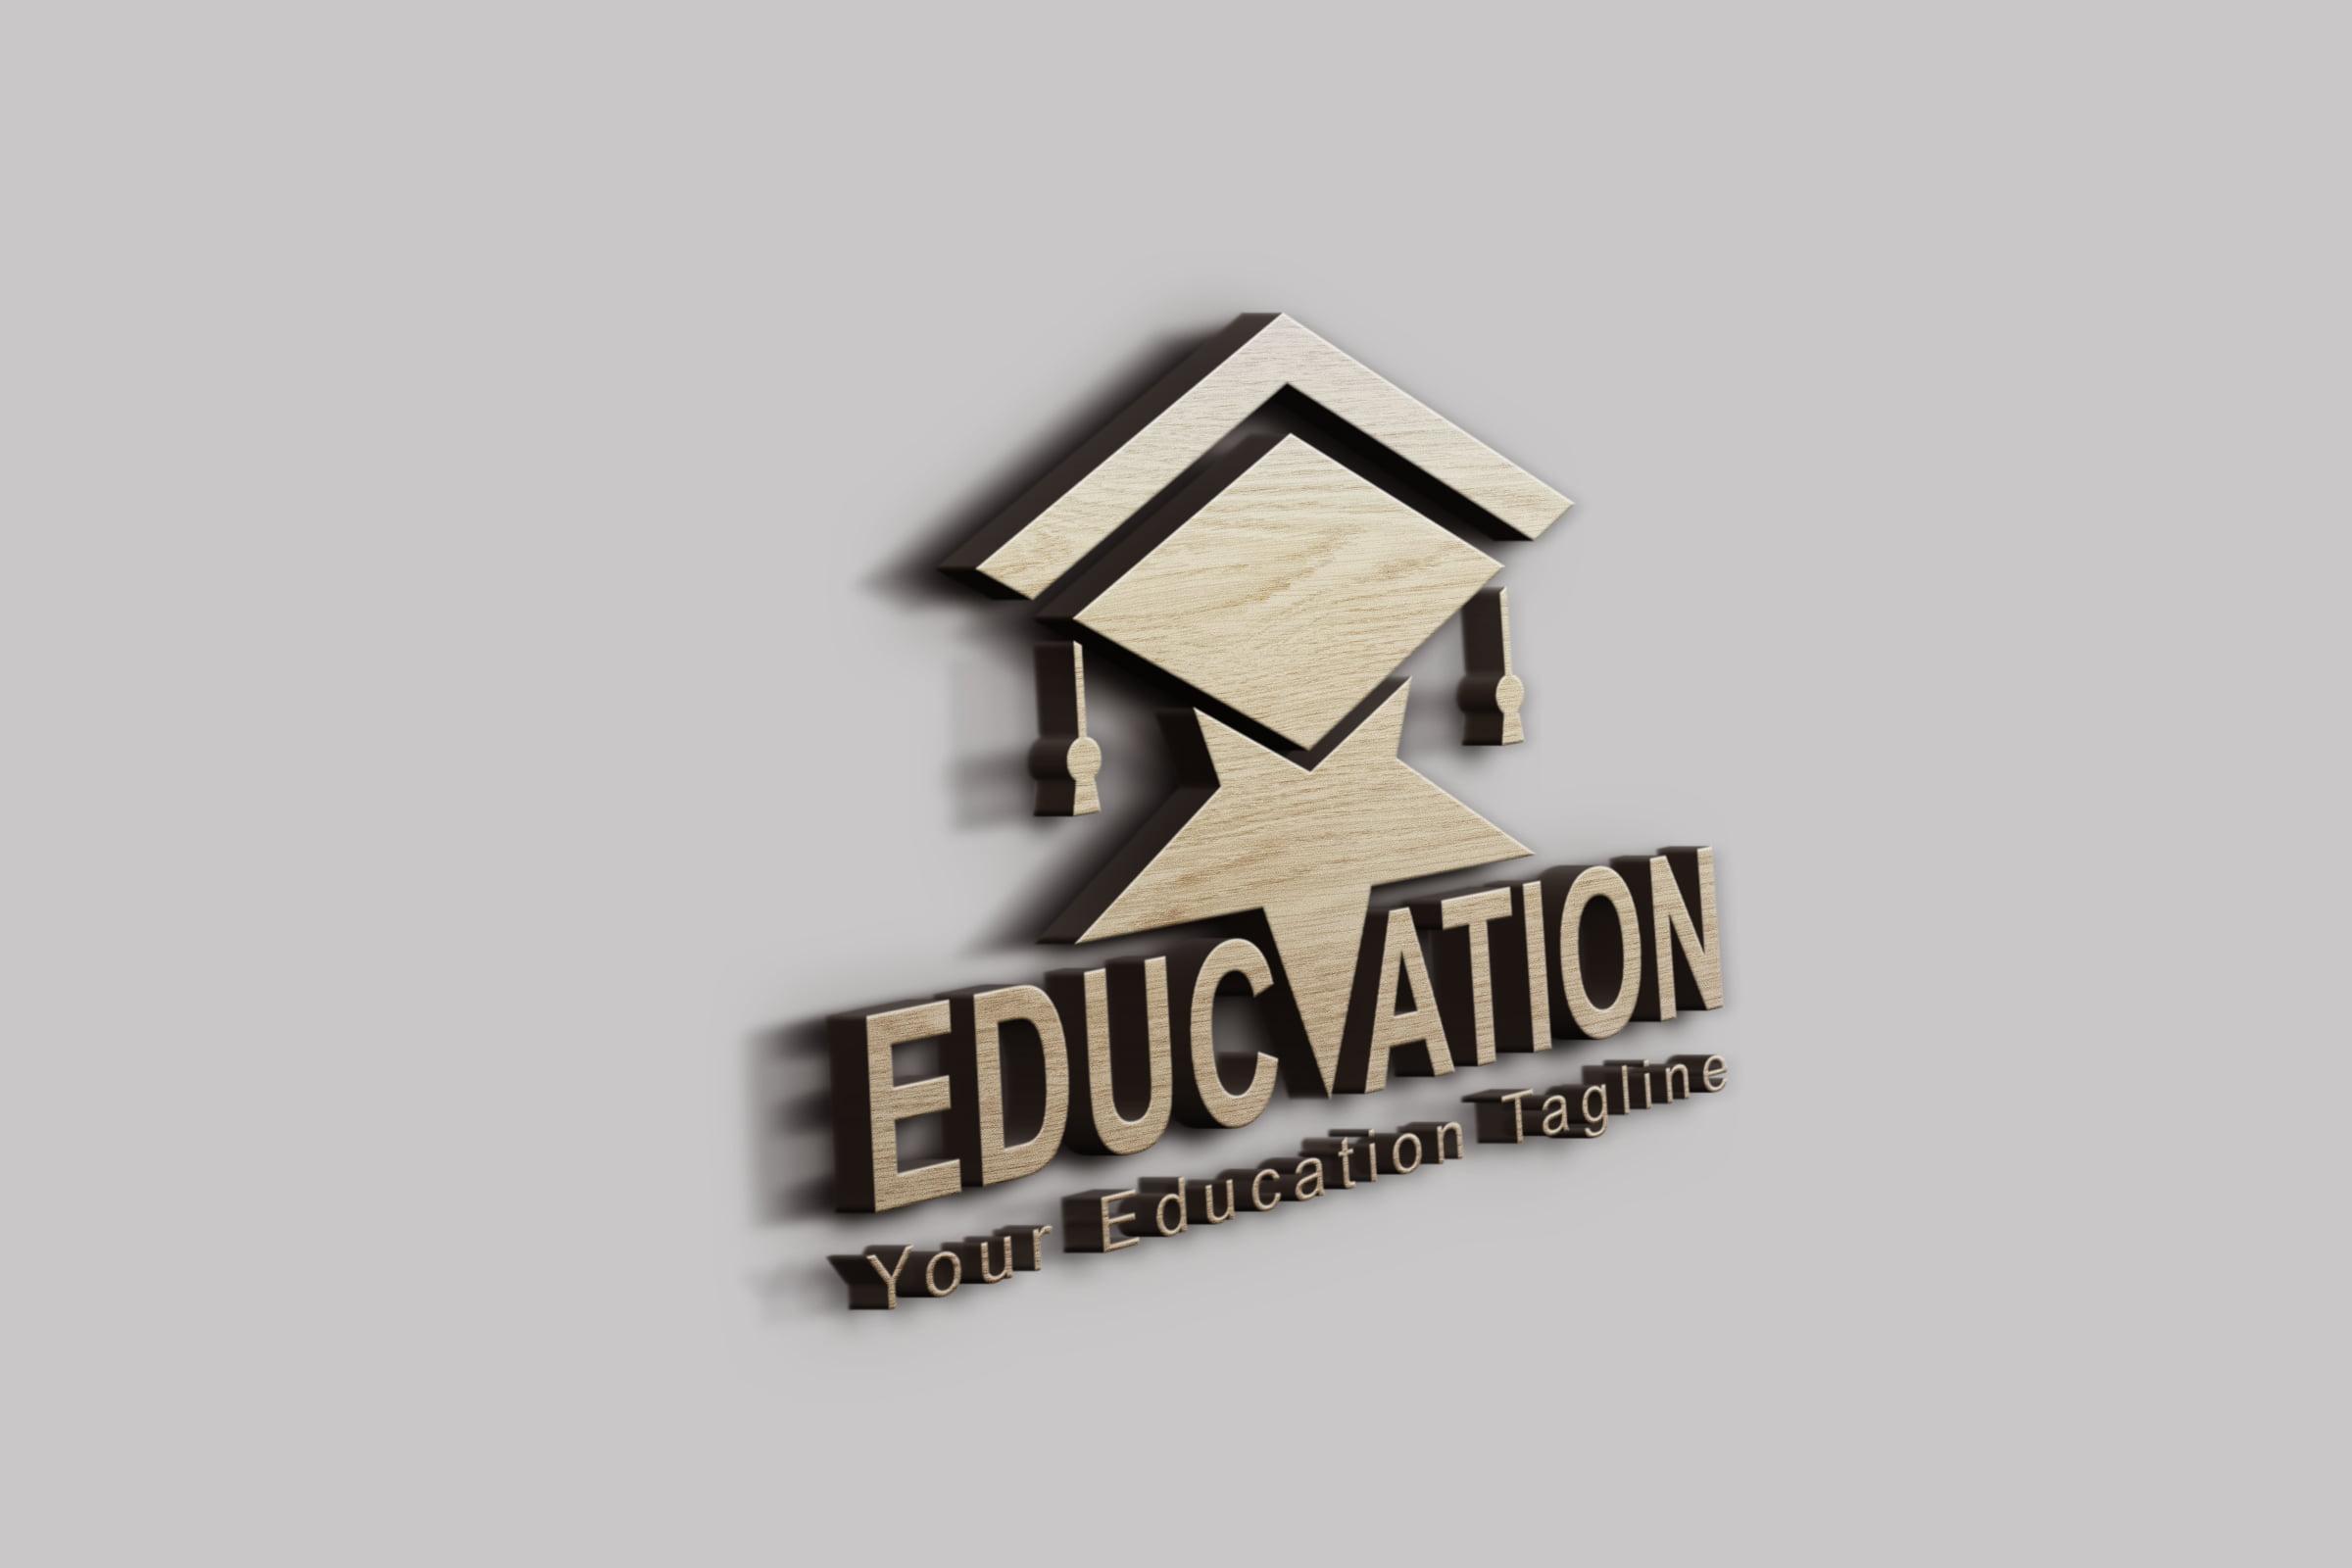 Star education logo design on 3d wall